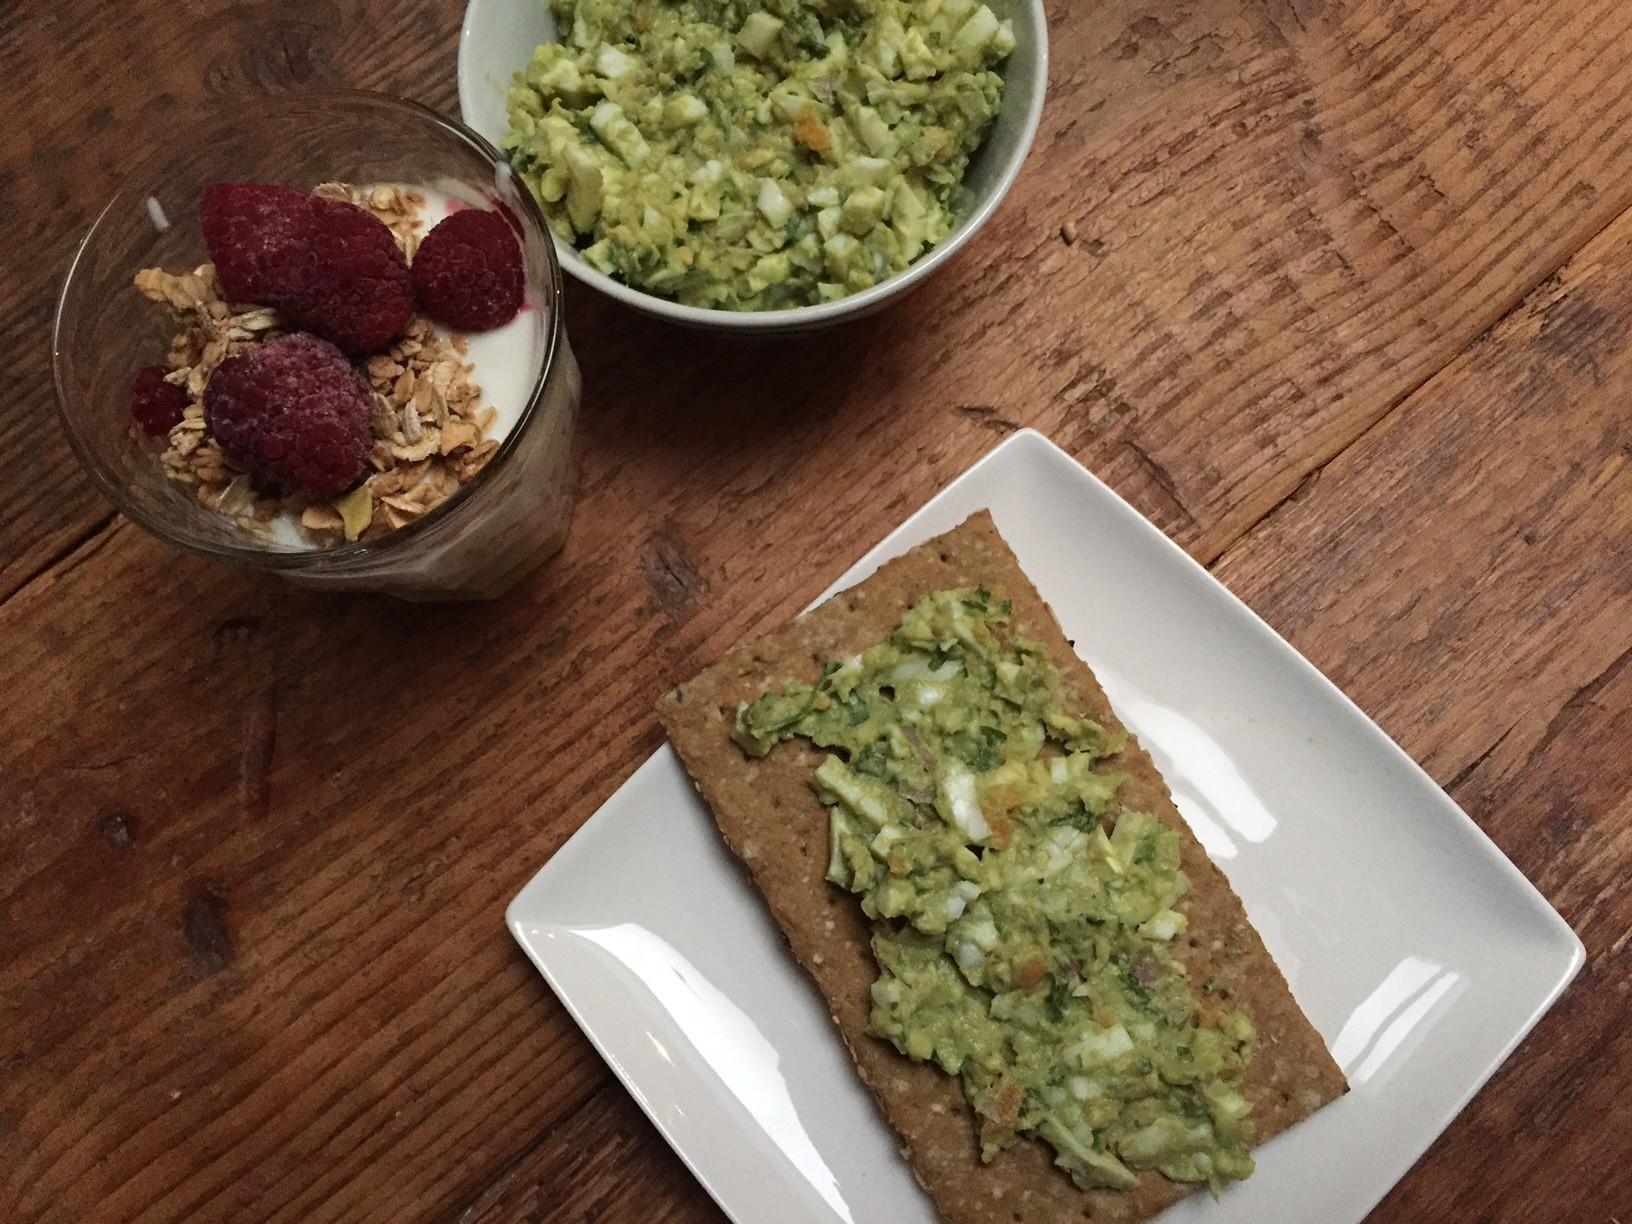 Avocado Eiersalade recept van foodblog Foodinista